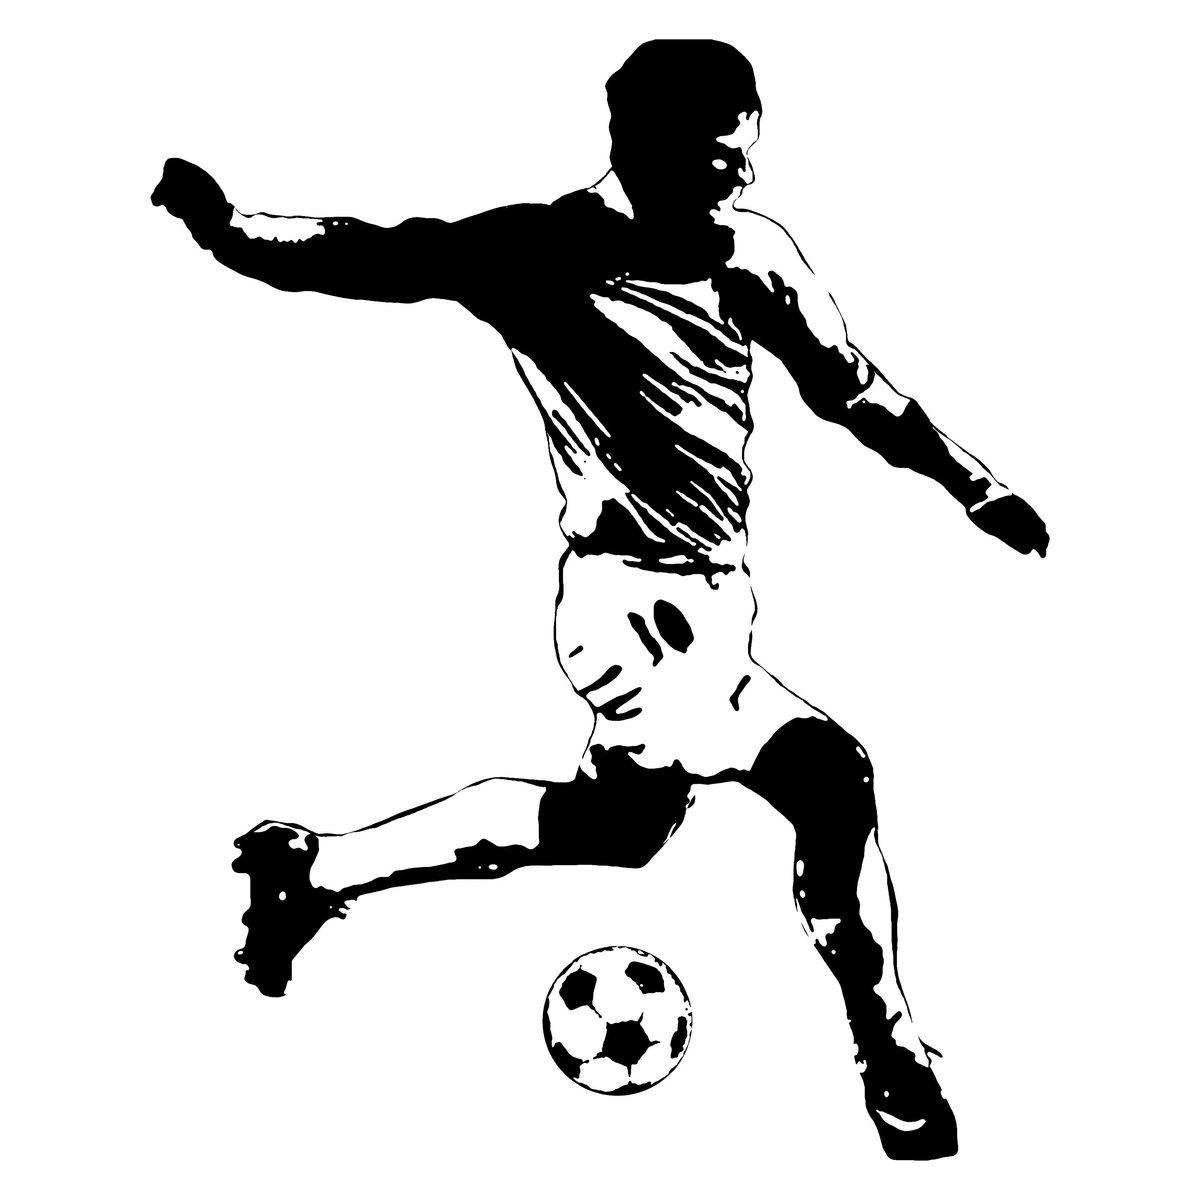 картинки про футбол черно белые пробковое